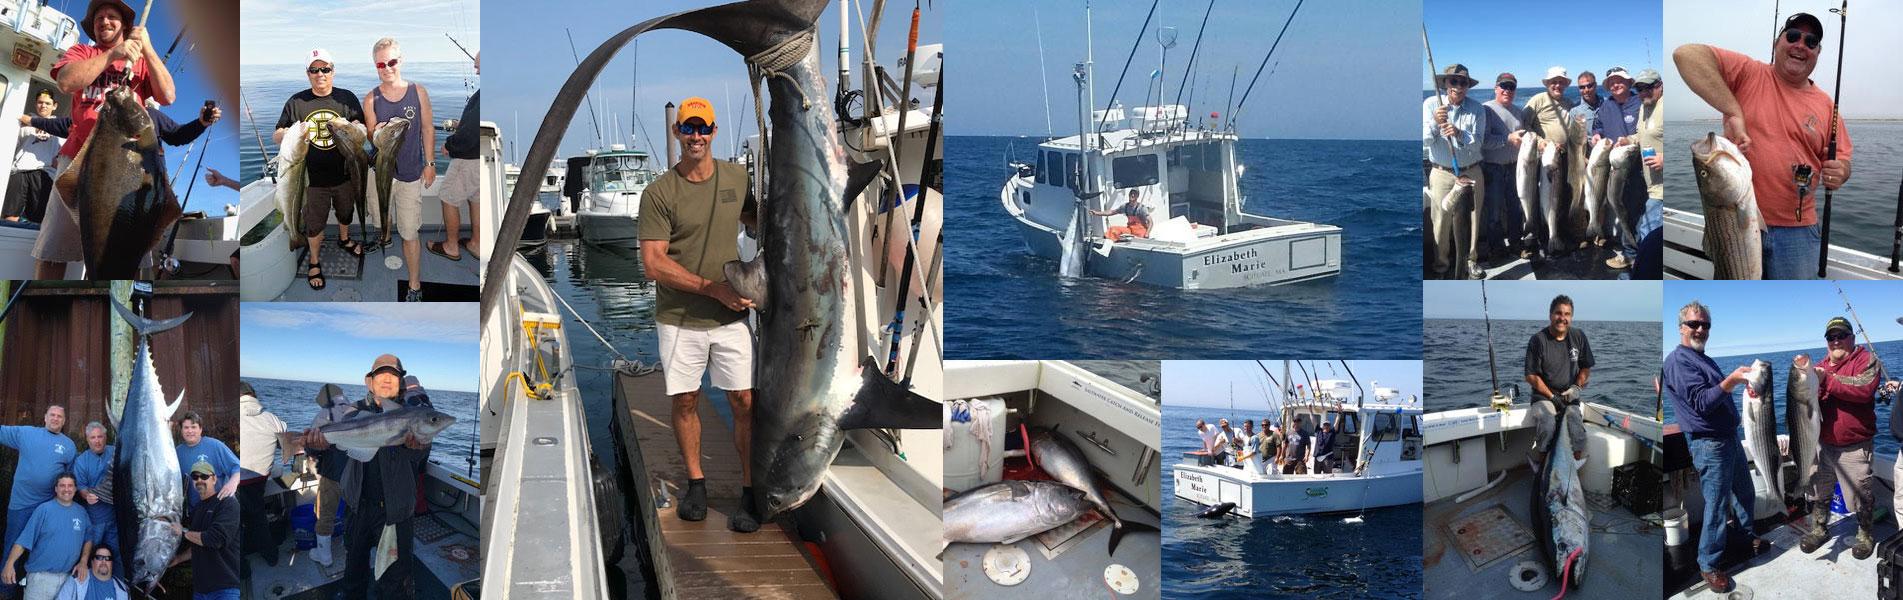 ELIZABETH MARIE SPORT FISHING - Slider1